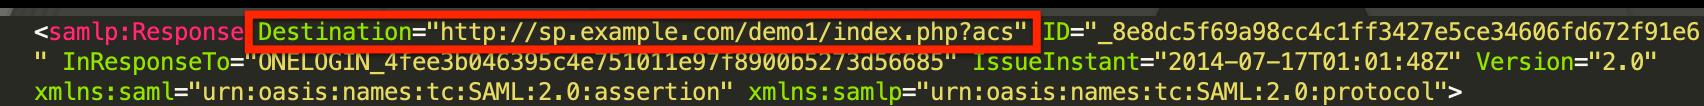 """Destination"" in a SAML response"